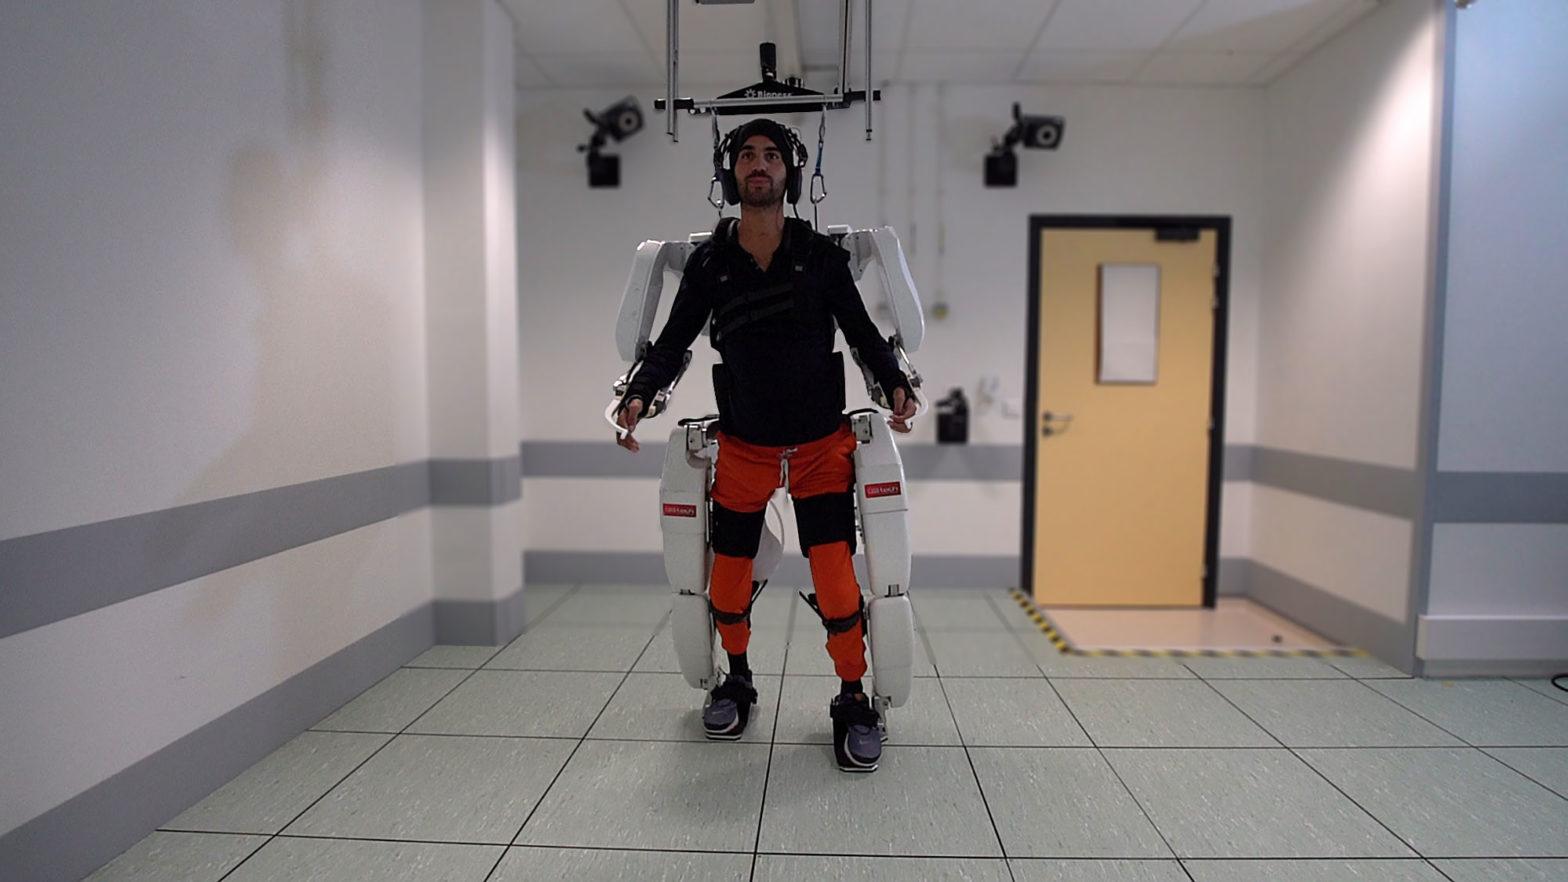 Brain-controlled Exoskeleton Demoed